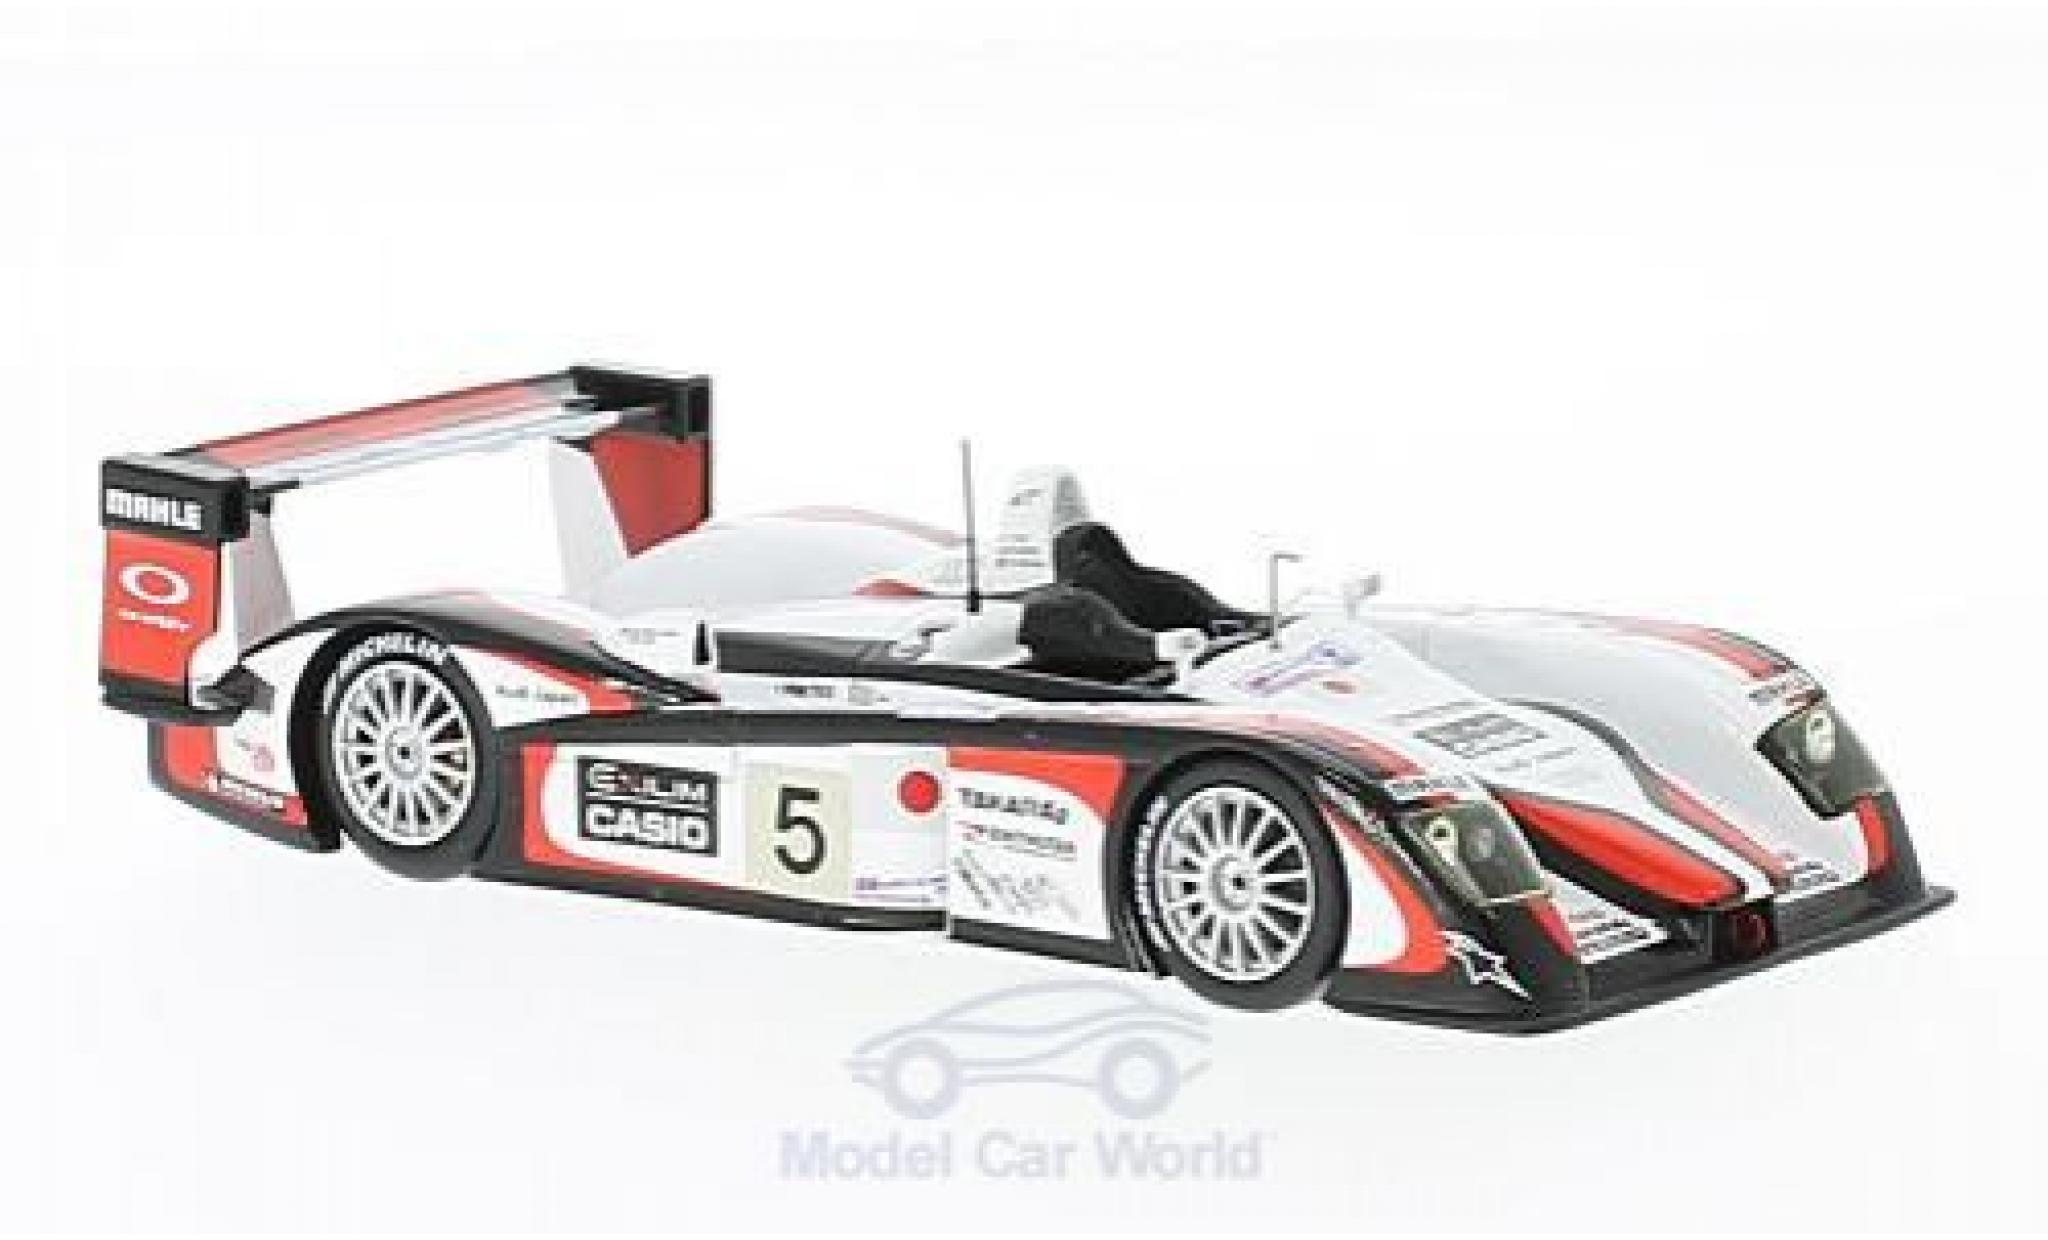 Audi R8 1/43 Spark No.5 Team GOH 24h Le Mans 2004 S.Ara/R.Capello/T.Kristensen